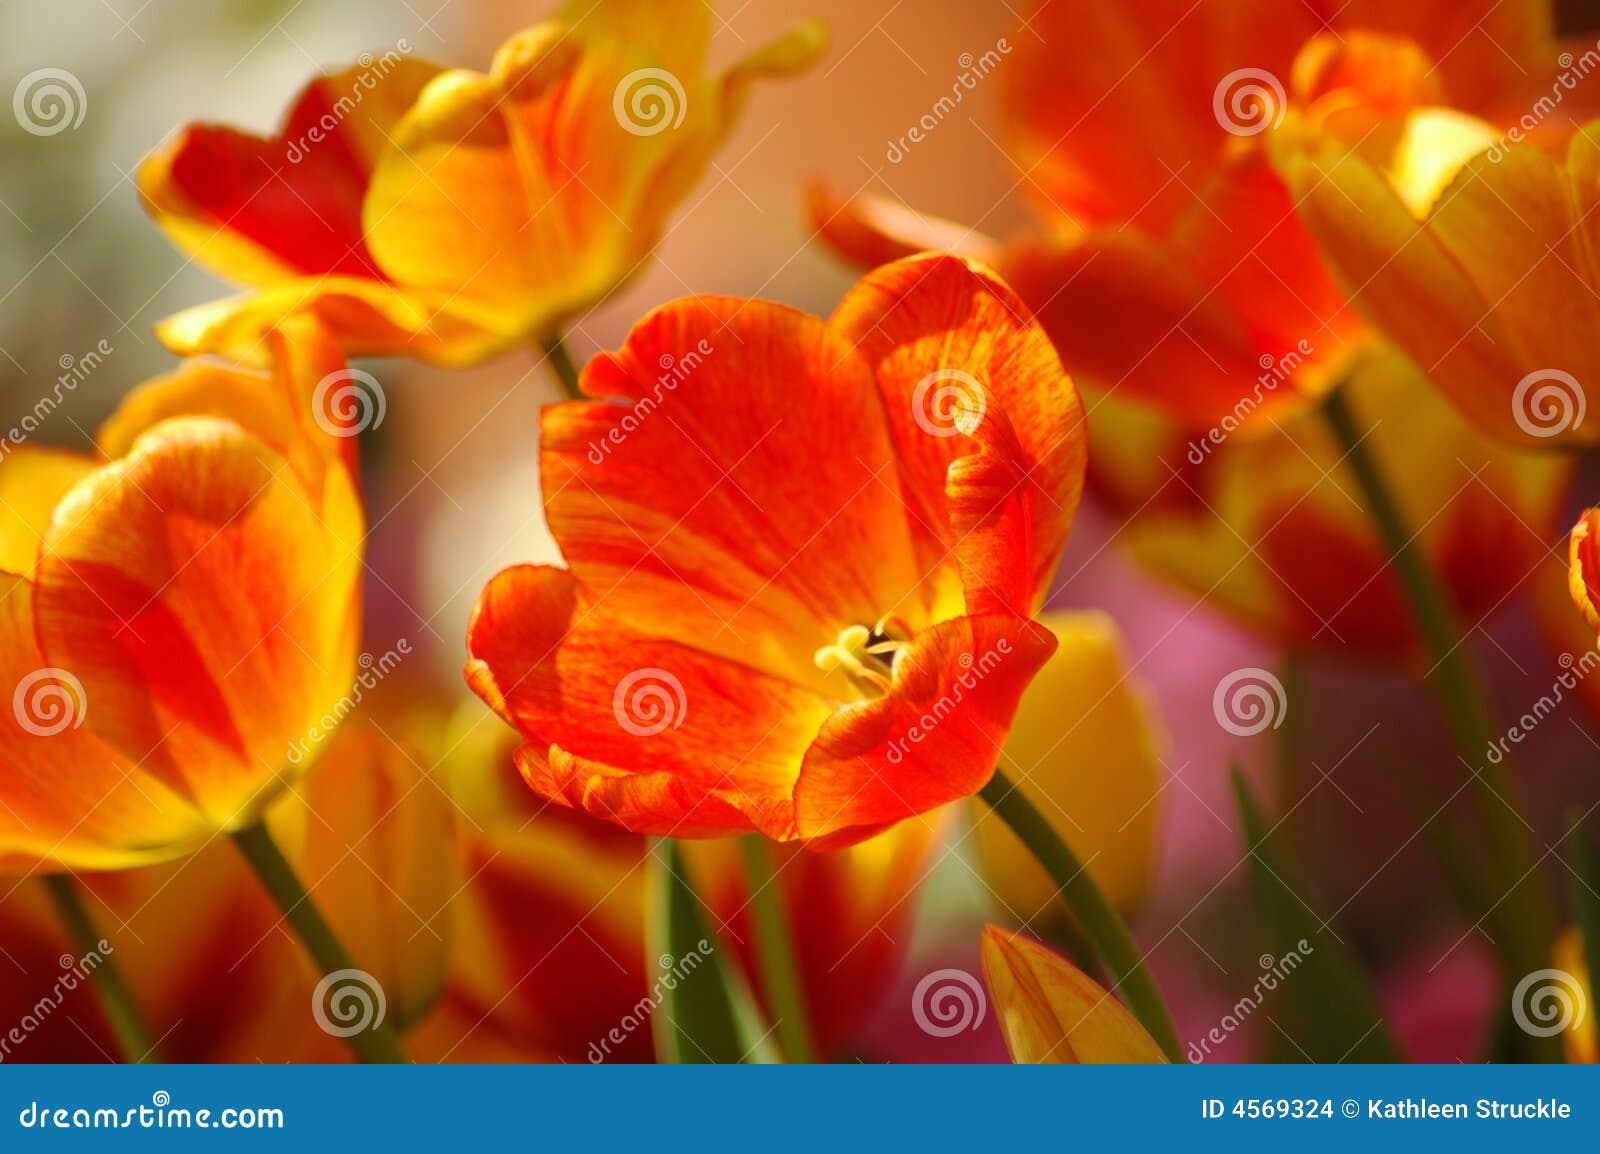 Élevage orange et jaune de tulipes